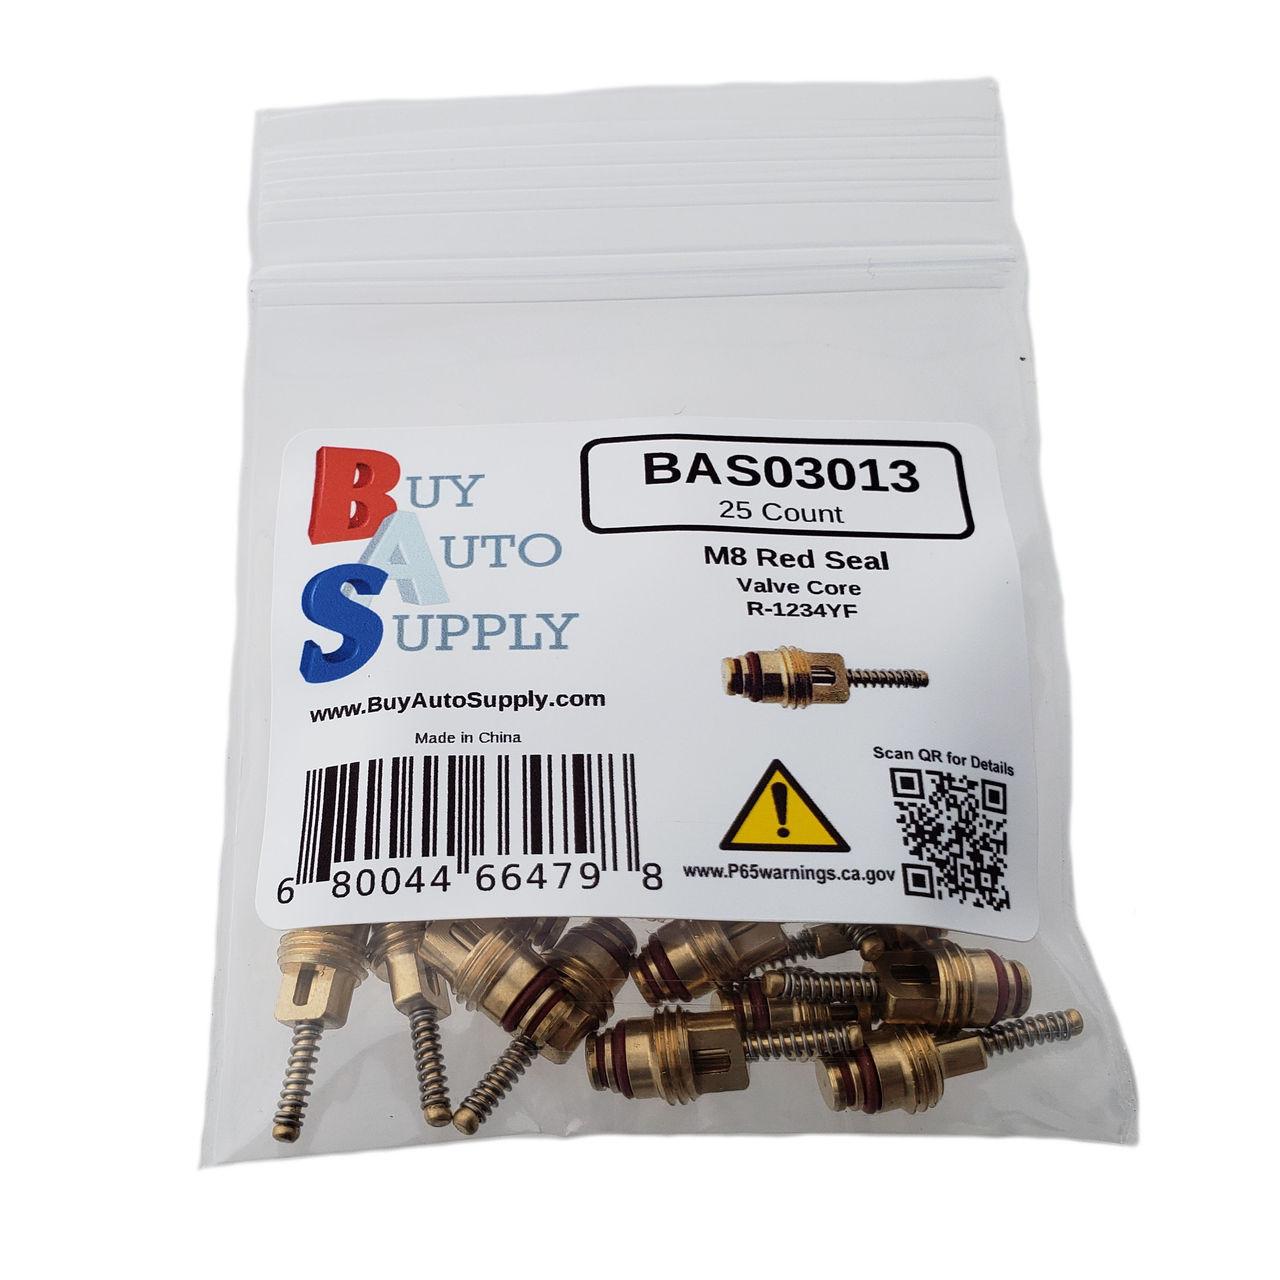 BAS03013 - 1234YF Valve Core - M8